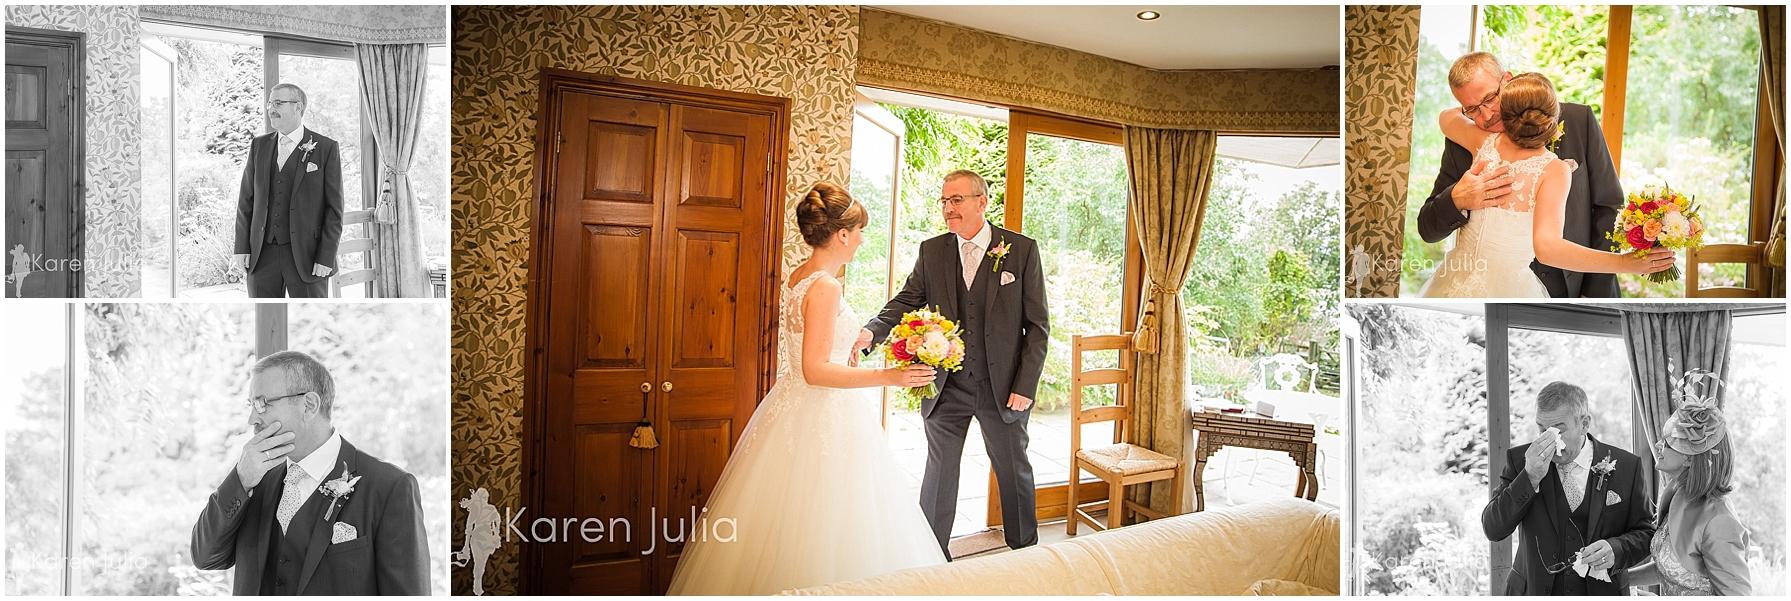 Miller-Howe-Hotel-Summer-Wedding-Photography-05